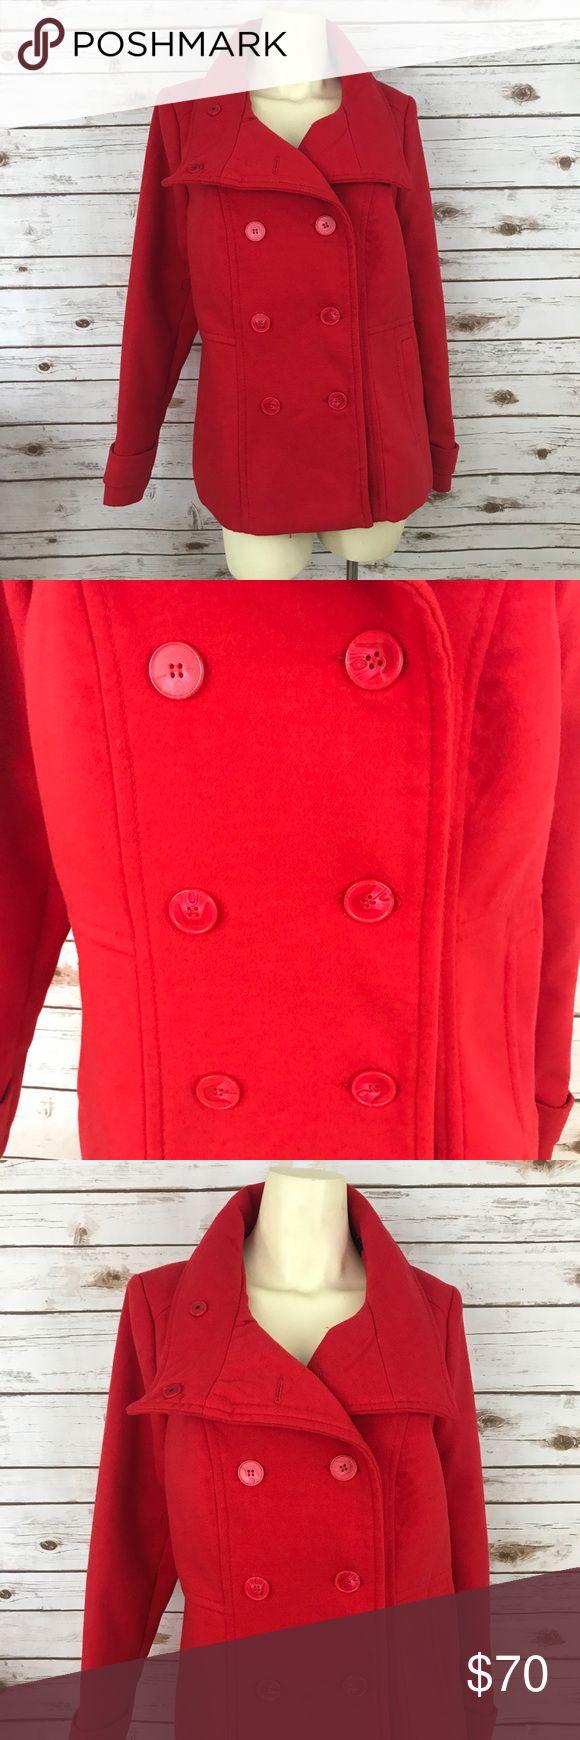 Torrid NEW red double breast Pea Coat size 0 New with tags Torrid red Pea Coat torrid Jackets & Coats Pea Coats